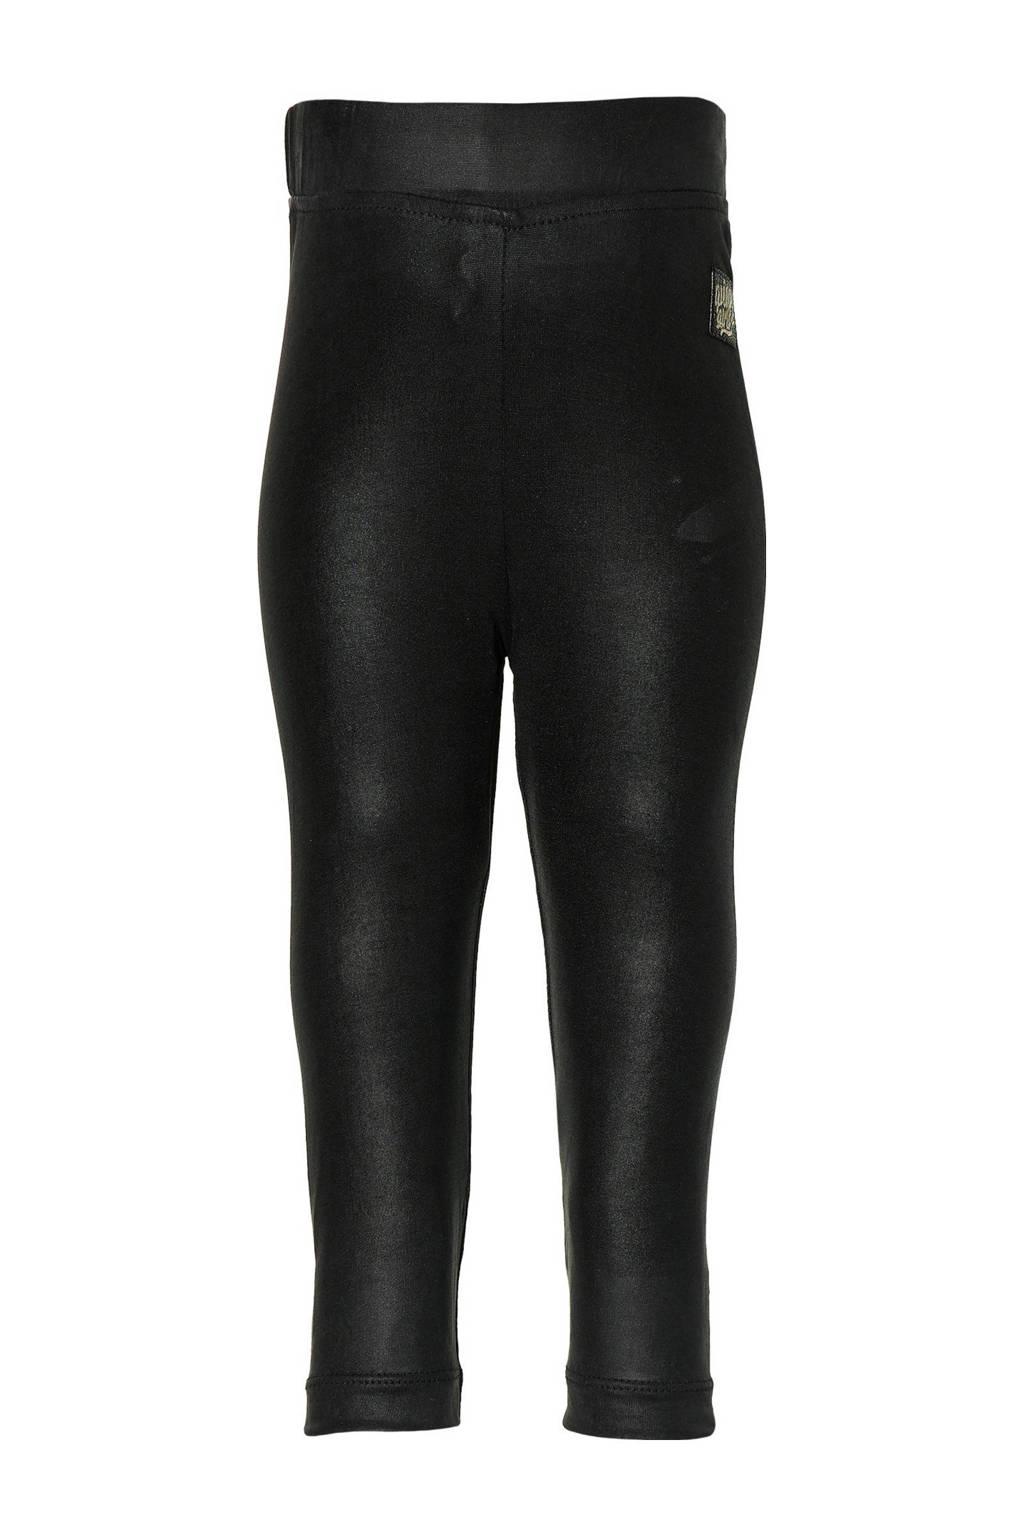 Quapi Mini regular fit legging Everly zwart, Zwart